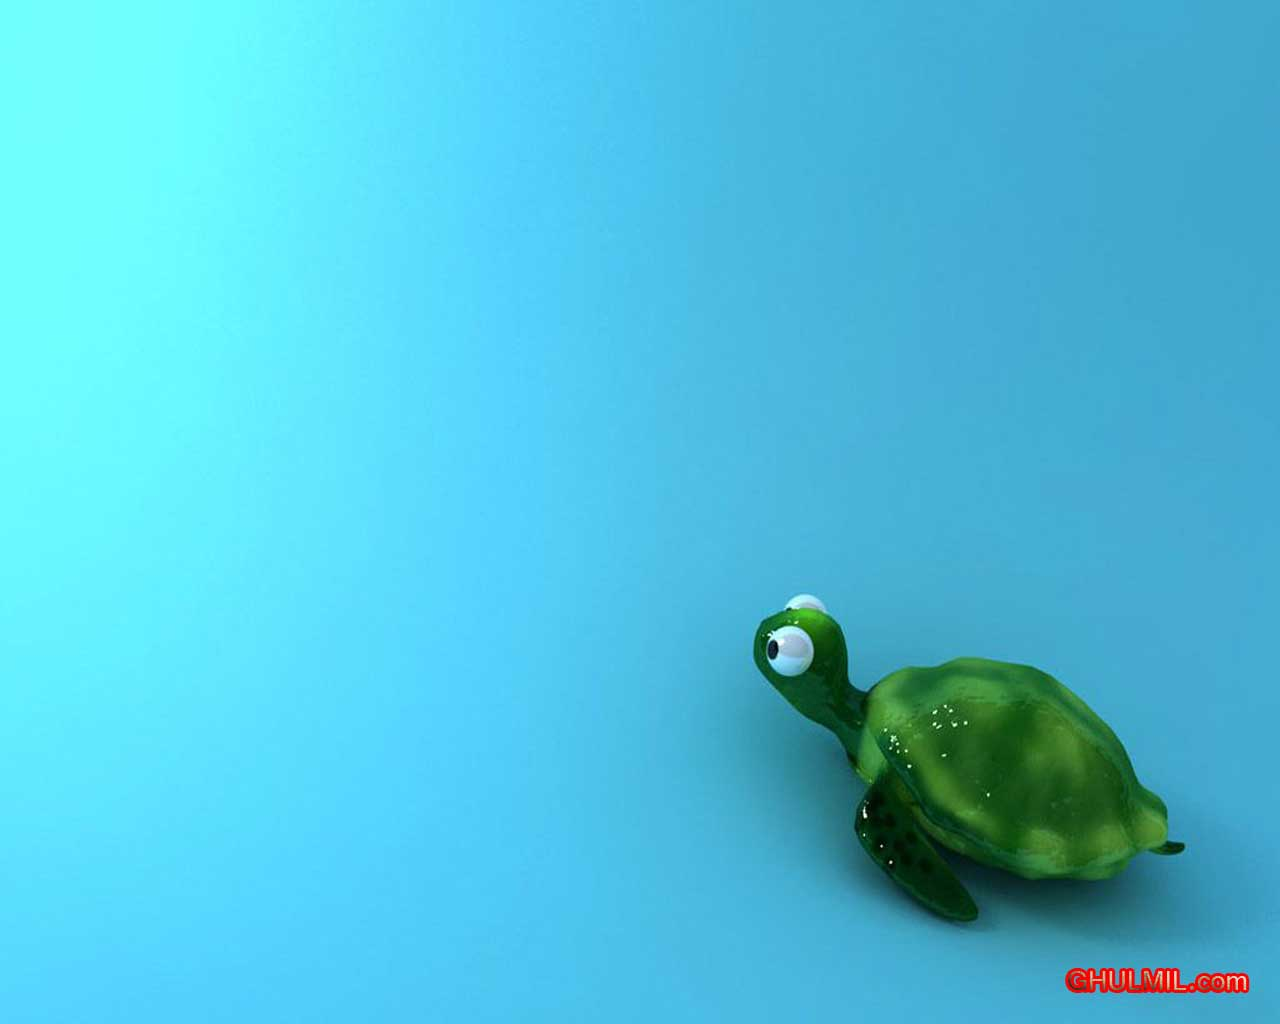 Cute Desktop Wallpaper Desktop Backgrounds Cu...